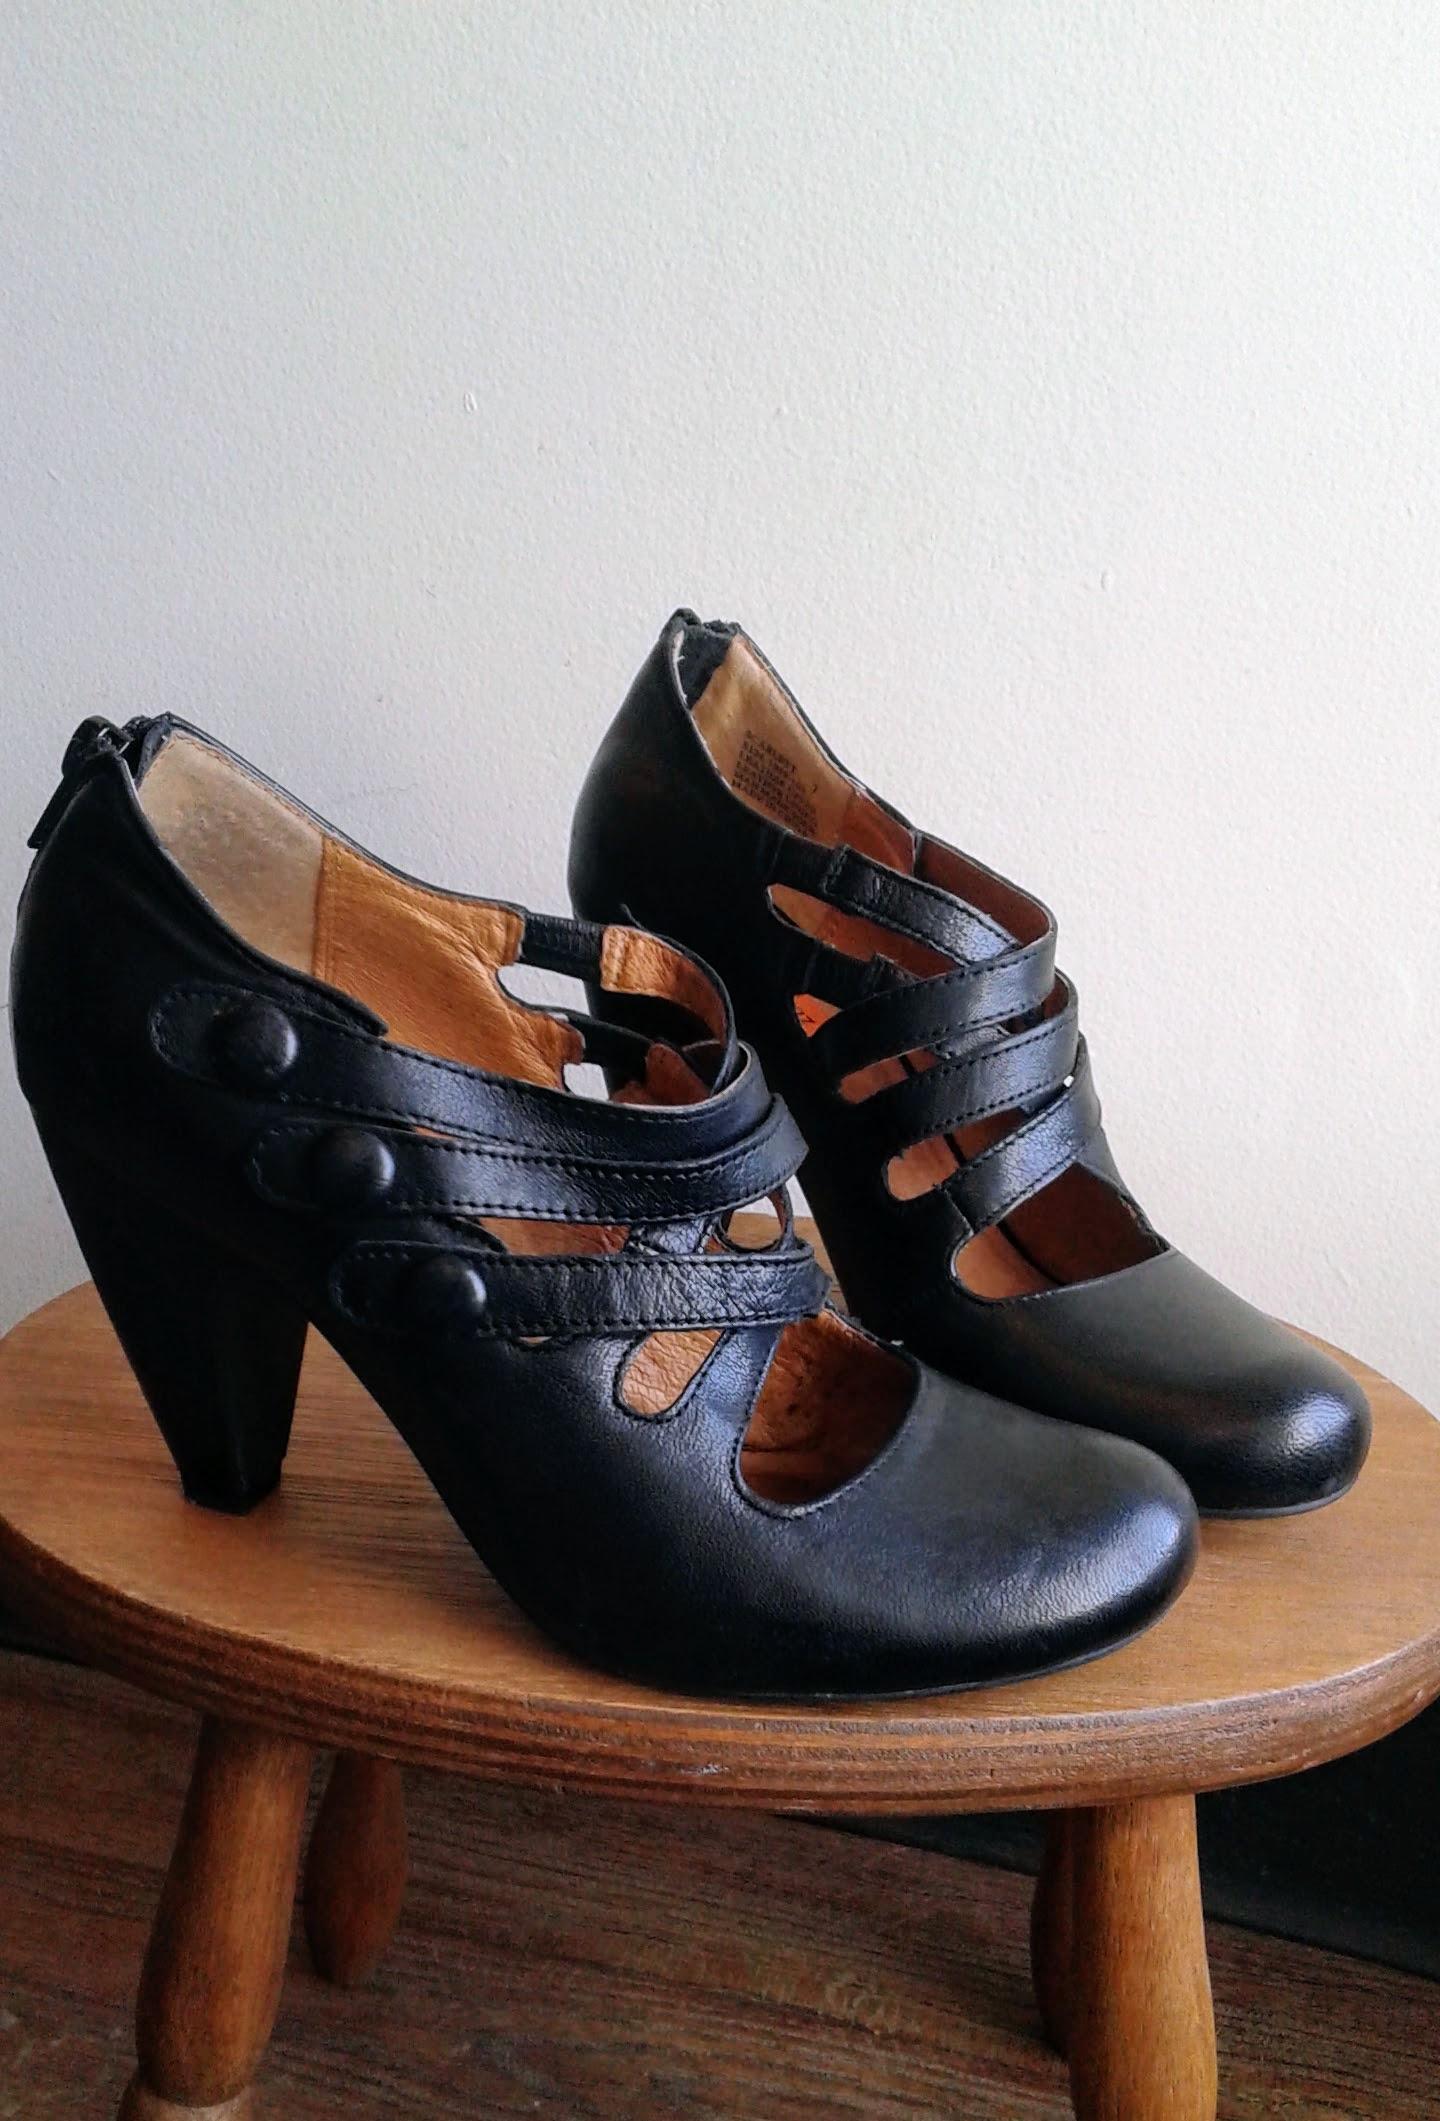 Miz Mooz shoes; S7.5, $45